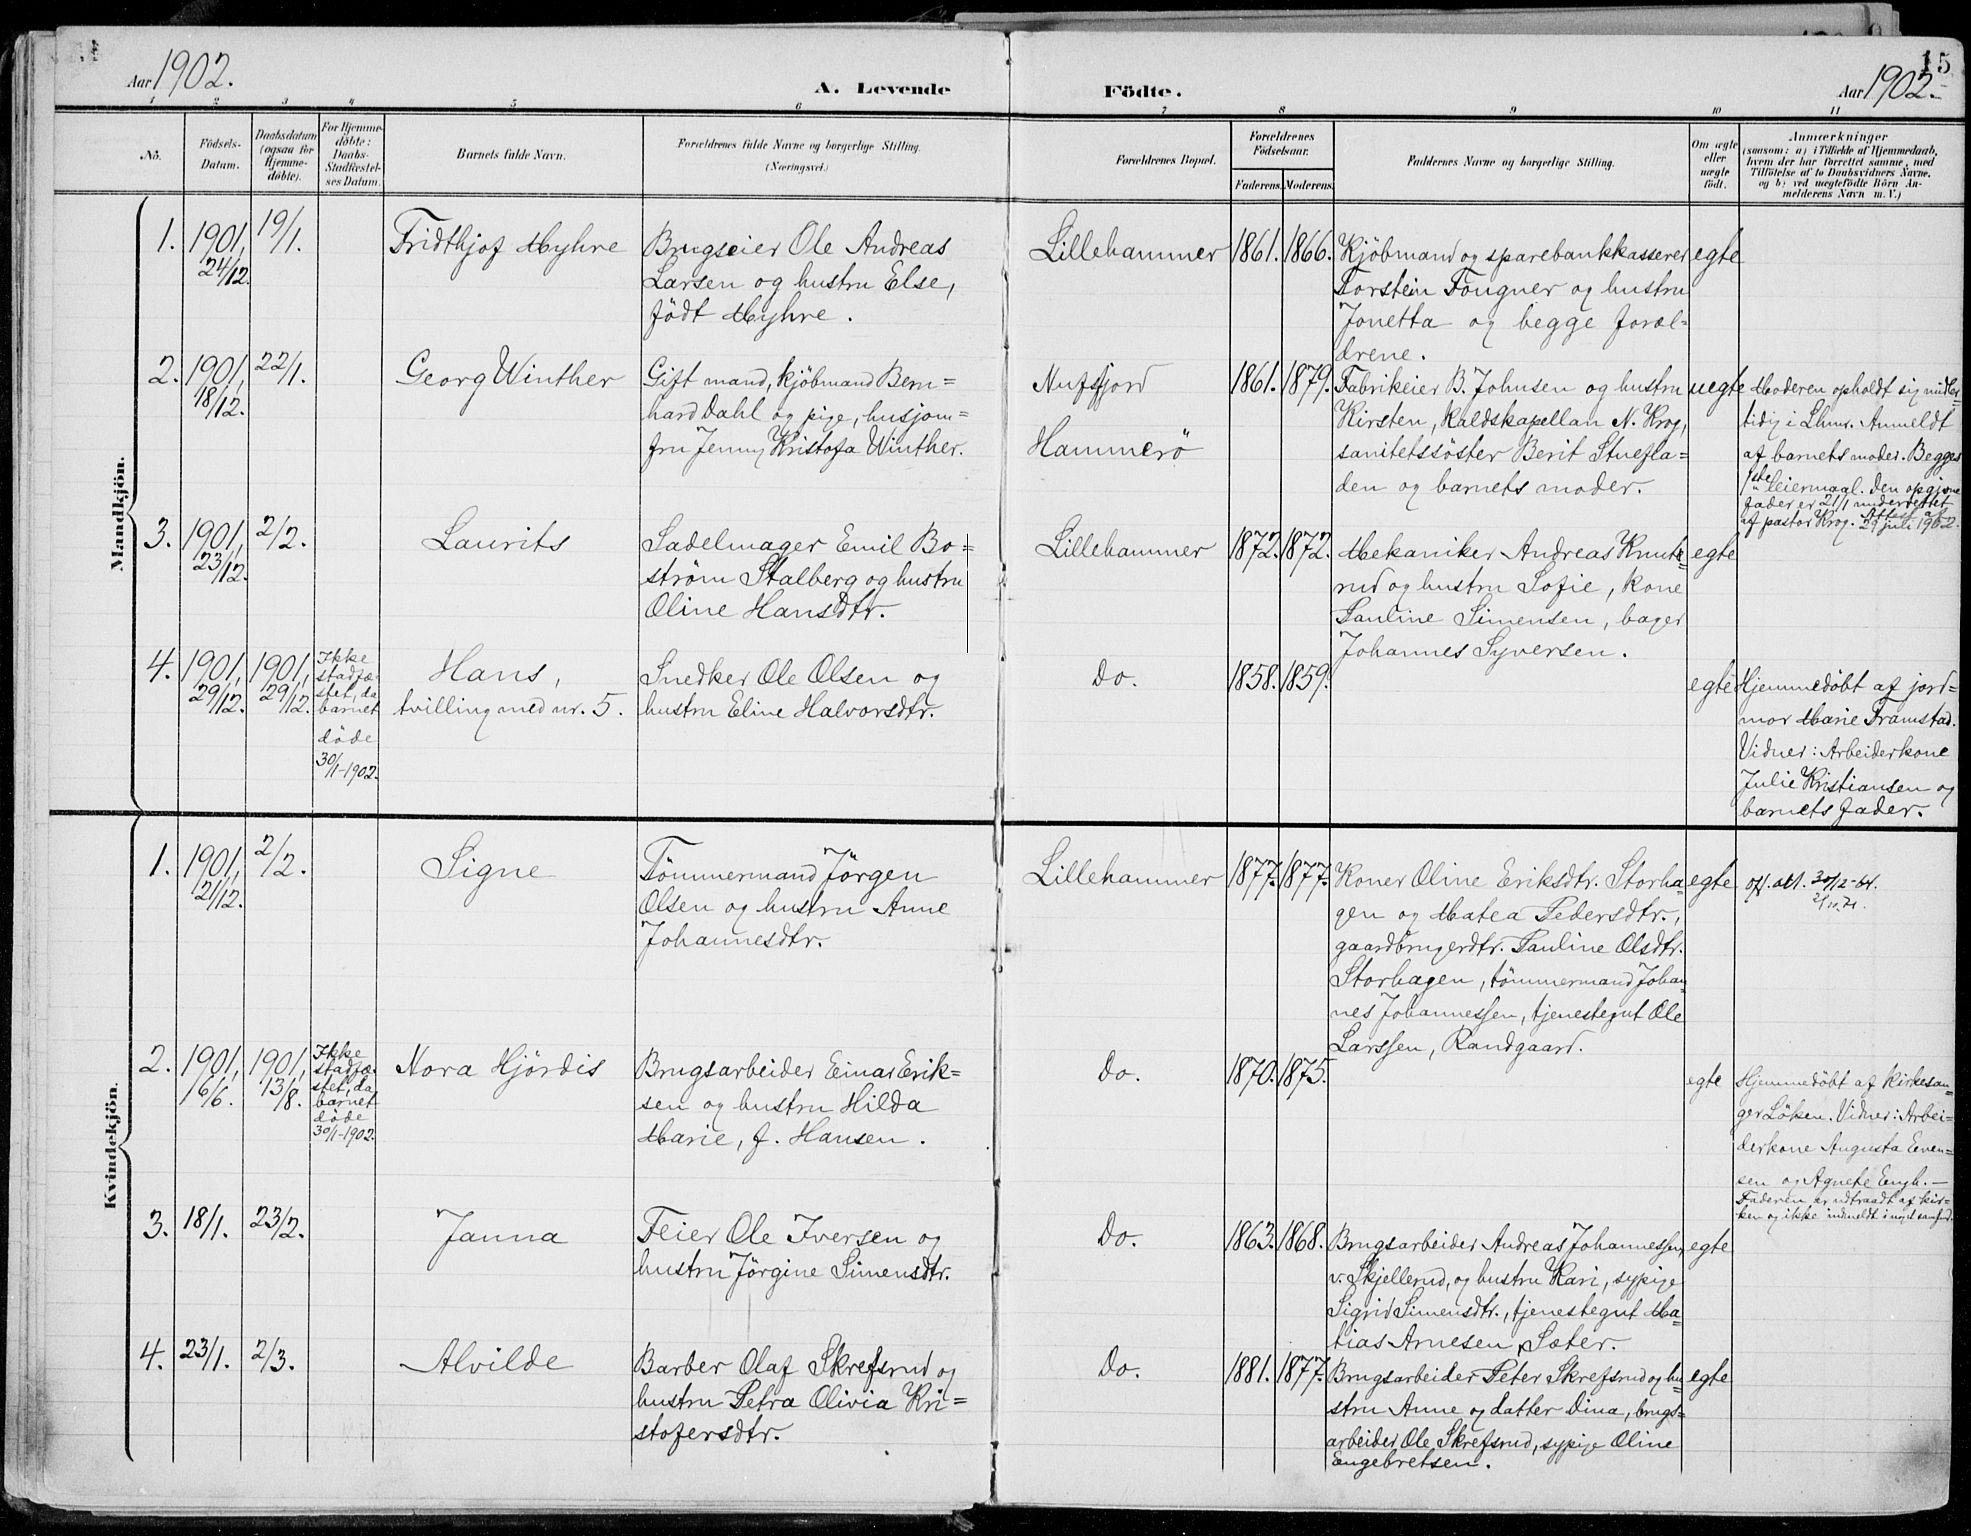 SAH, Lillehammer prestekontor, Ministerialbok nr. 1, 1901-1916, s. 15